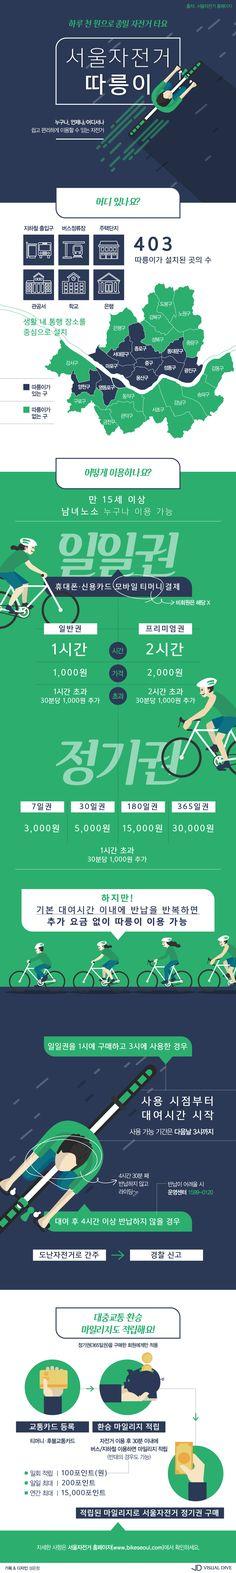 vd-bikeseoul-160906